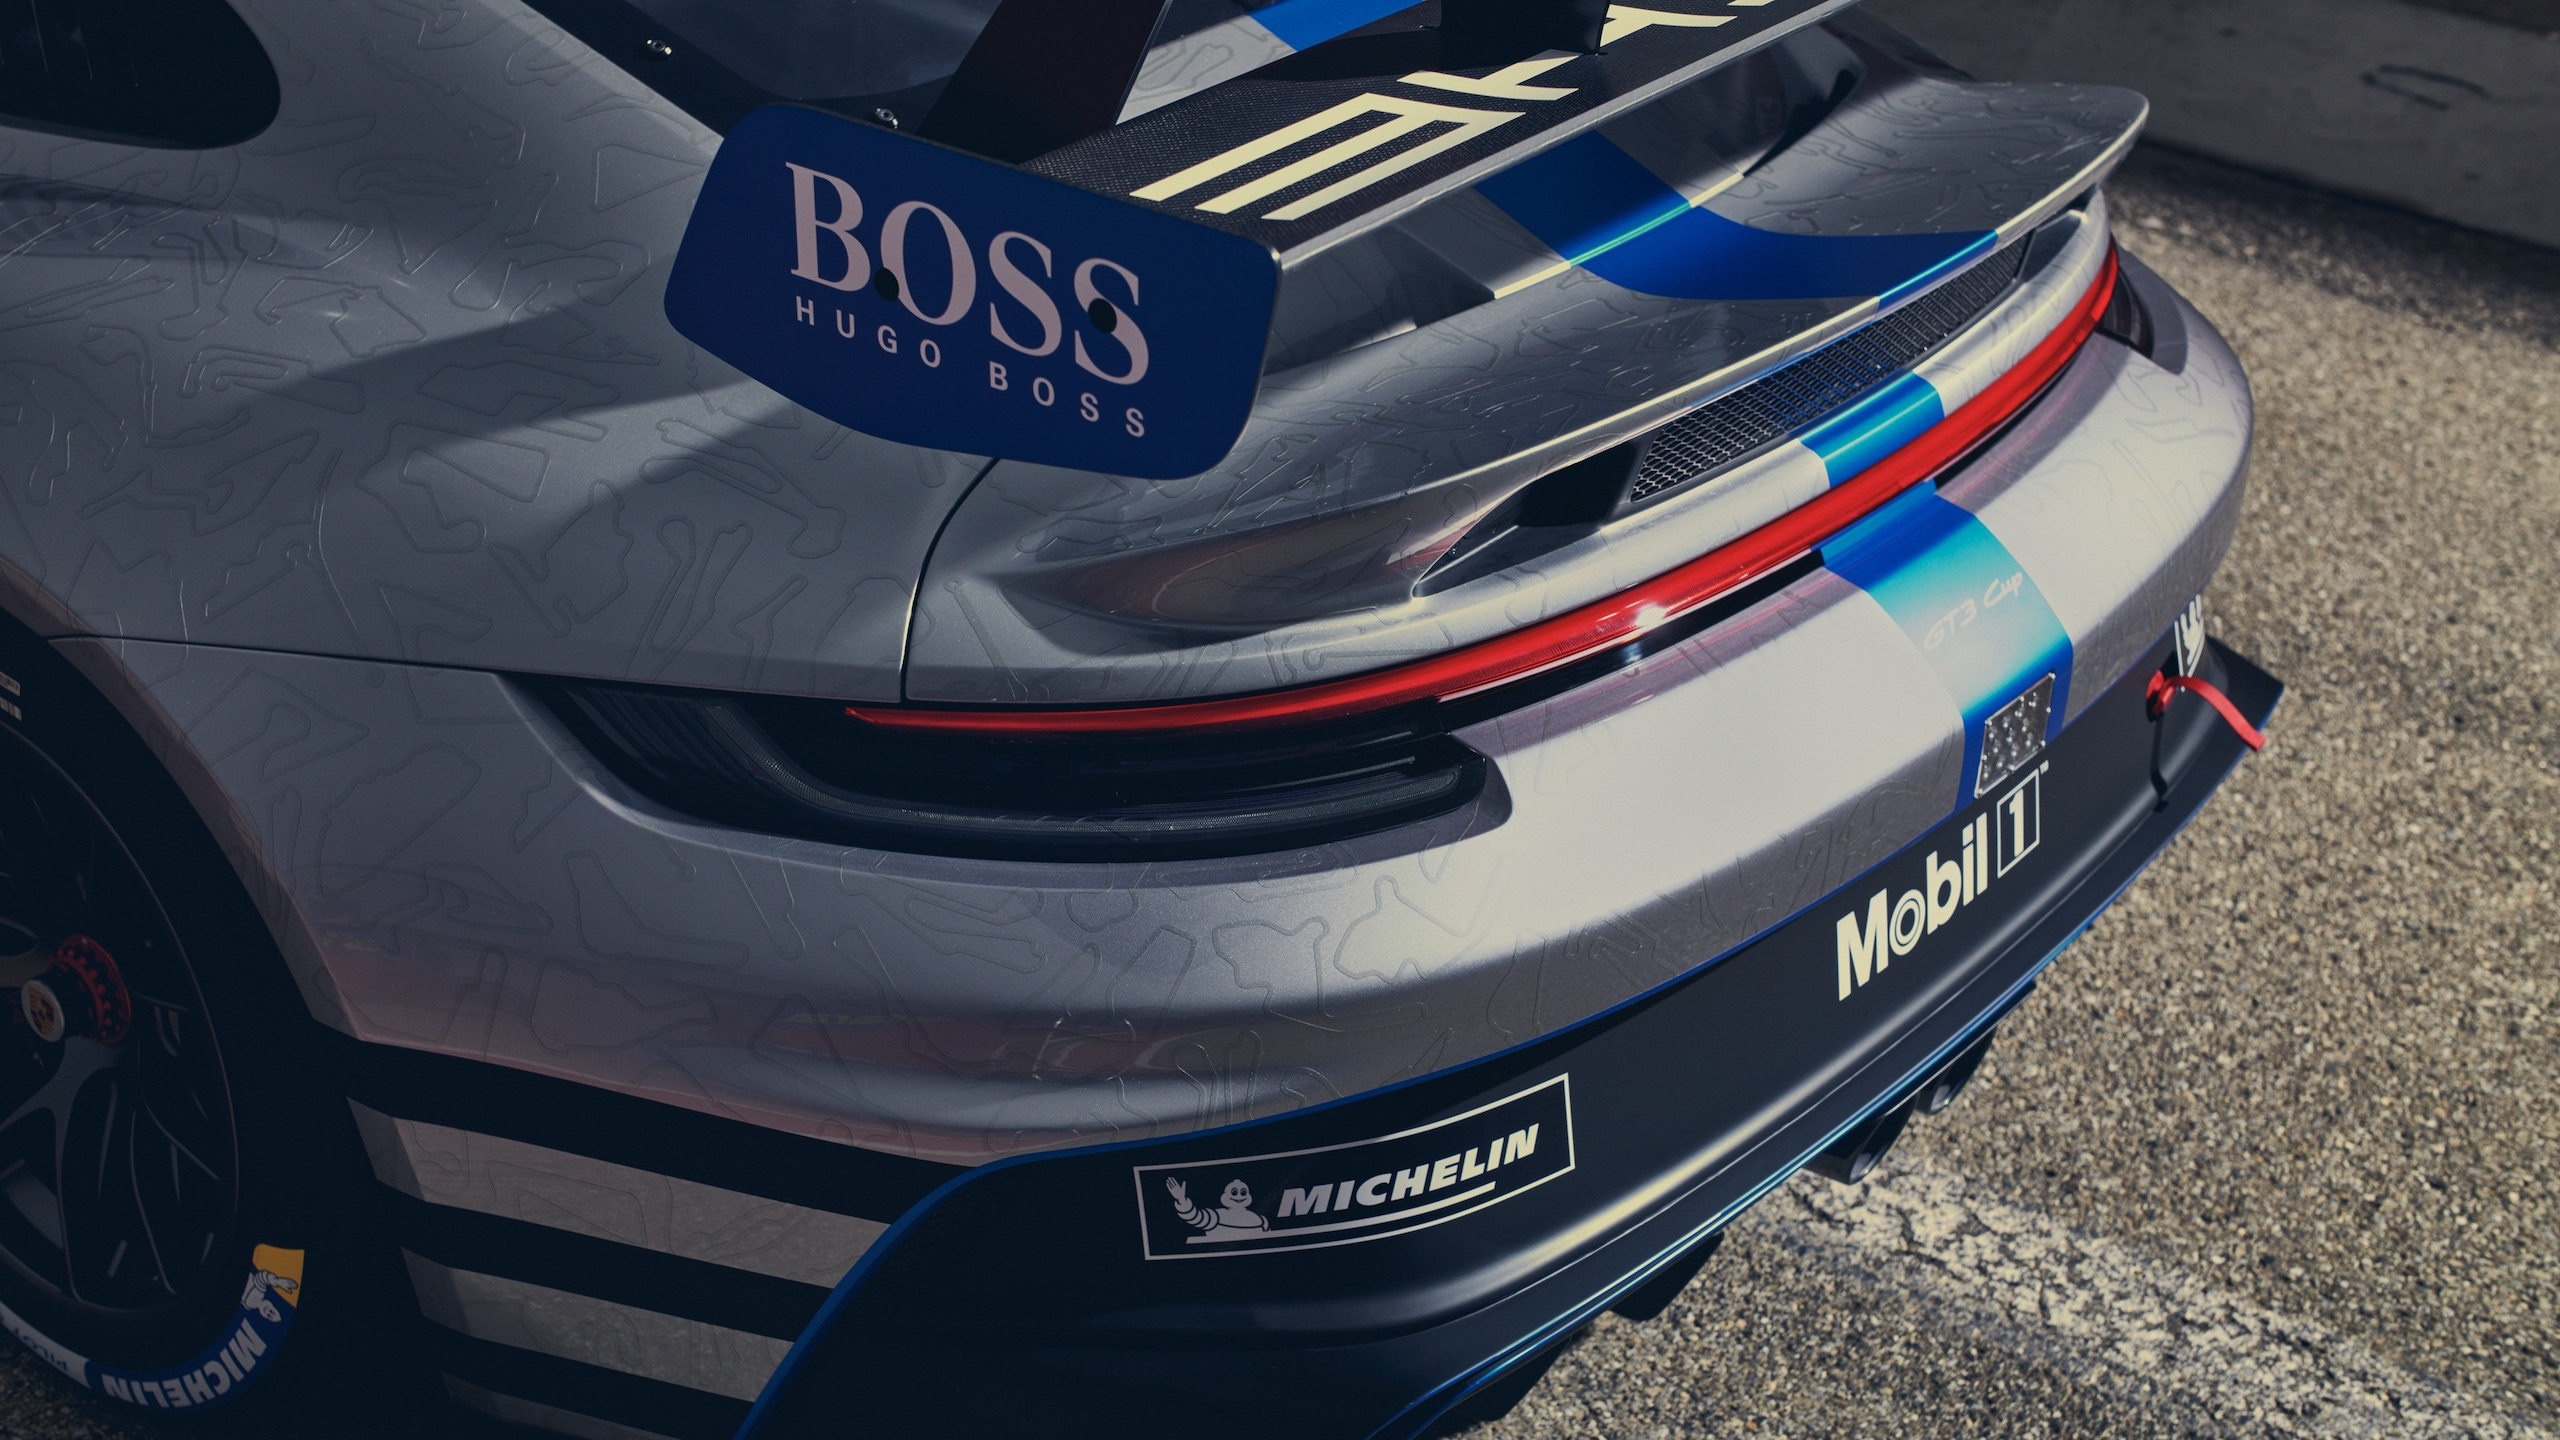 Porsche 911 GT3 rear fascia detail